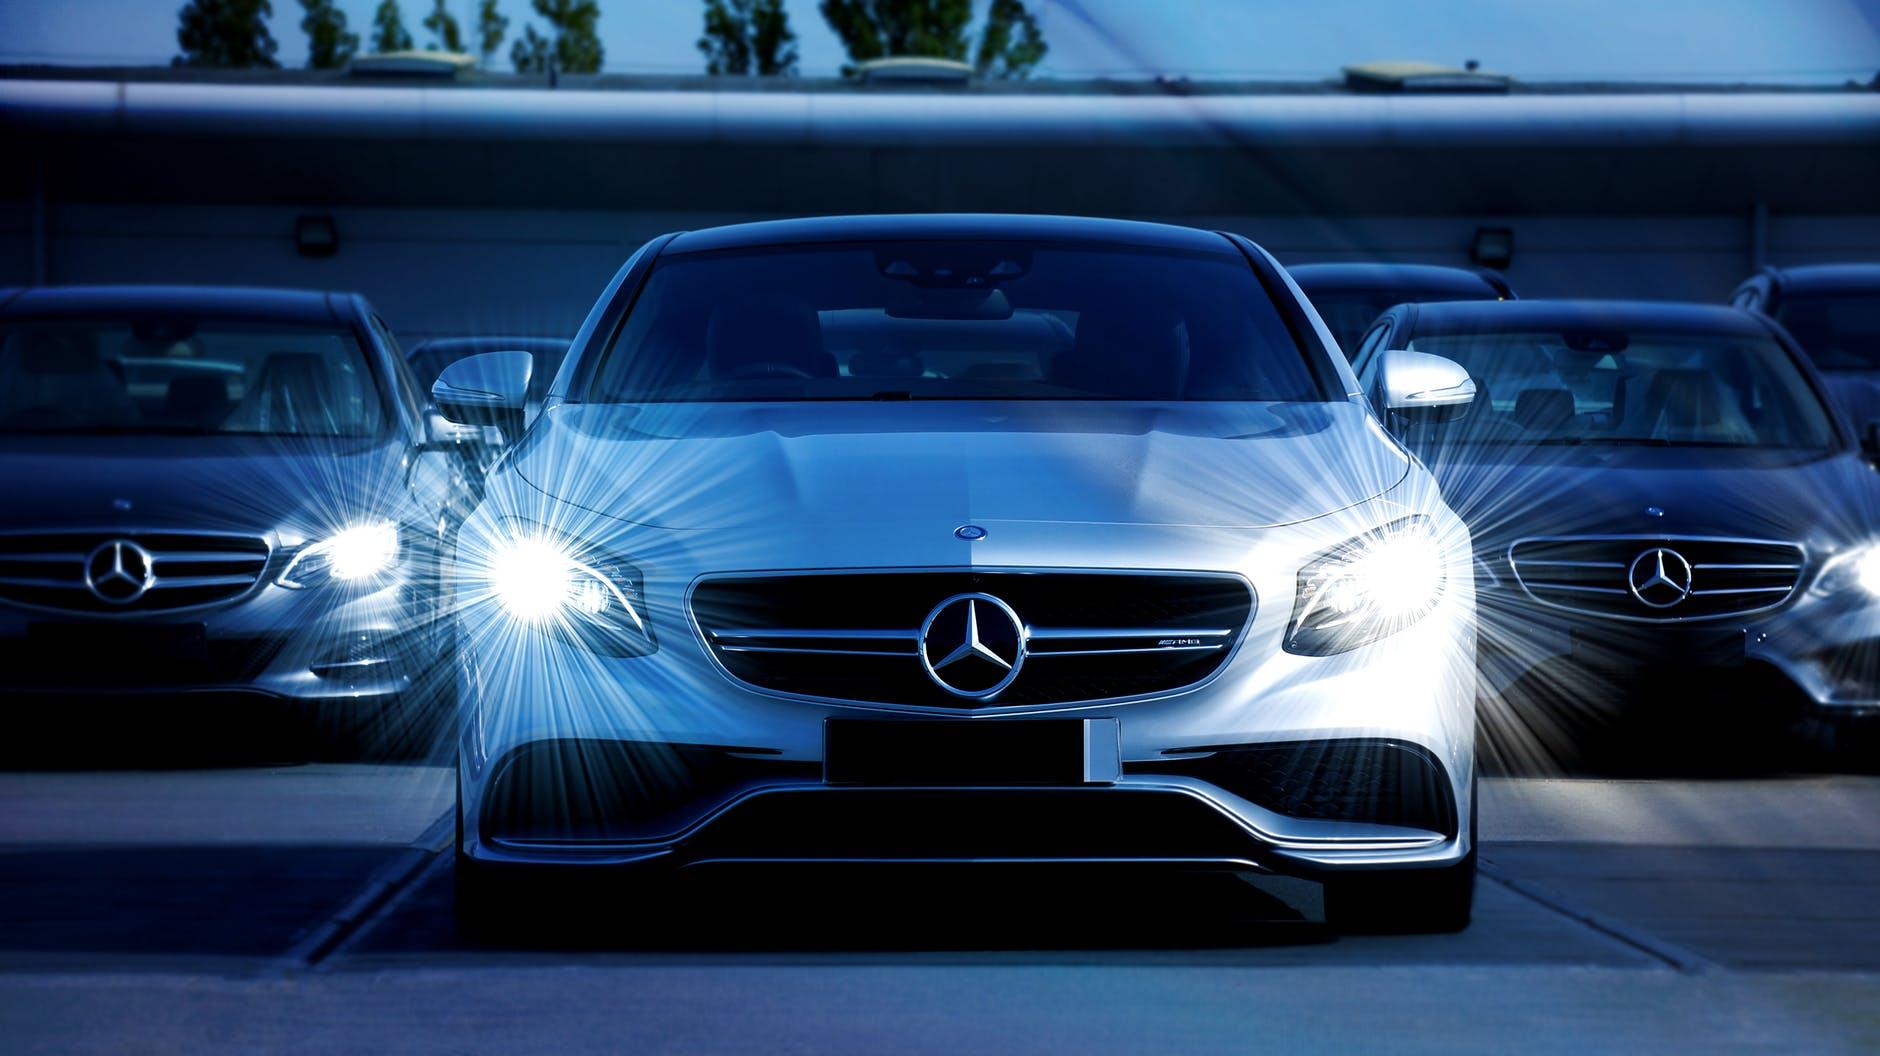 Mercedes Benz Hire Purchase Car